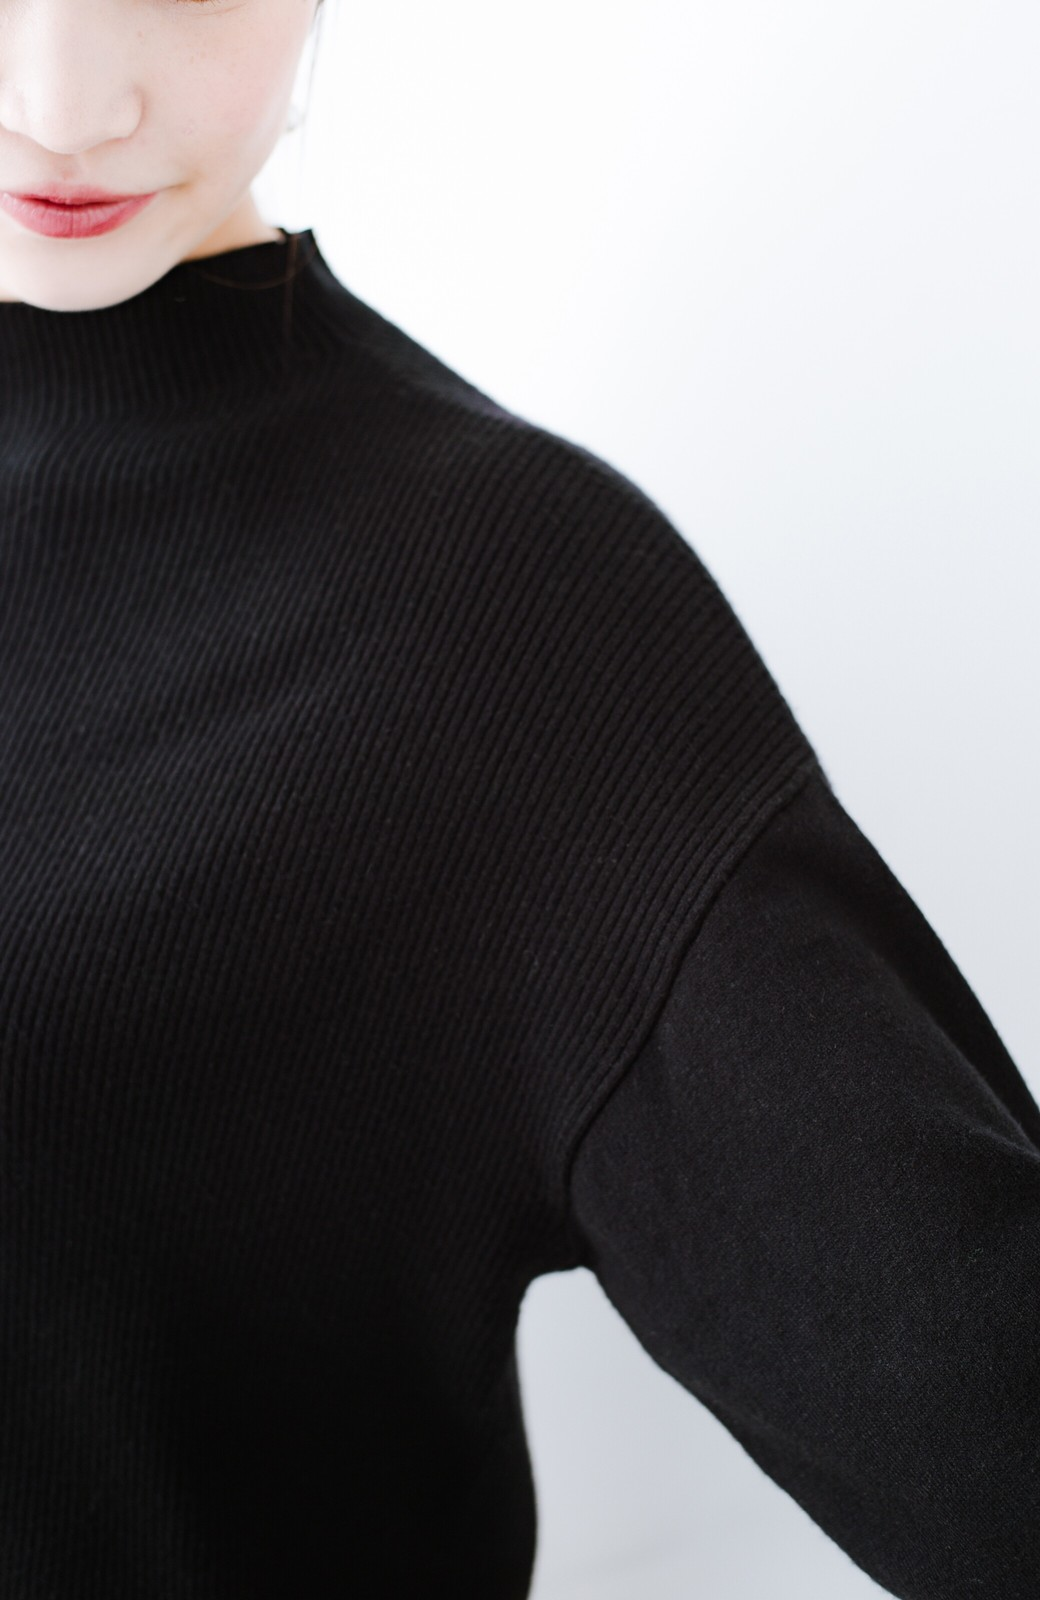 haco! 気になるところをそっと隠してくれる便利なリブニット <ブラック>の商品写真4